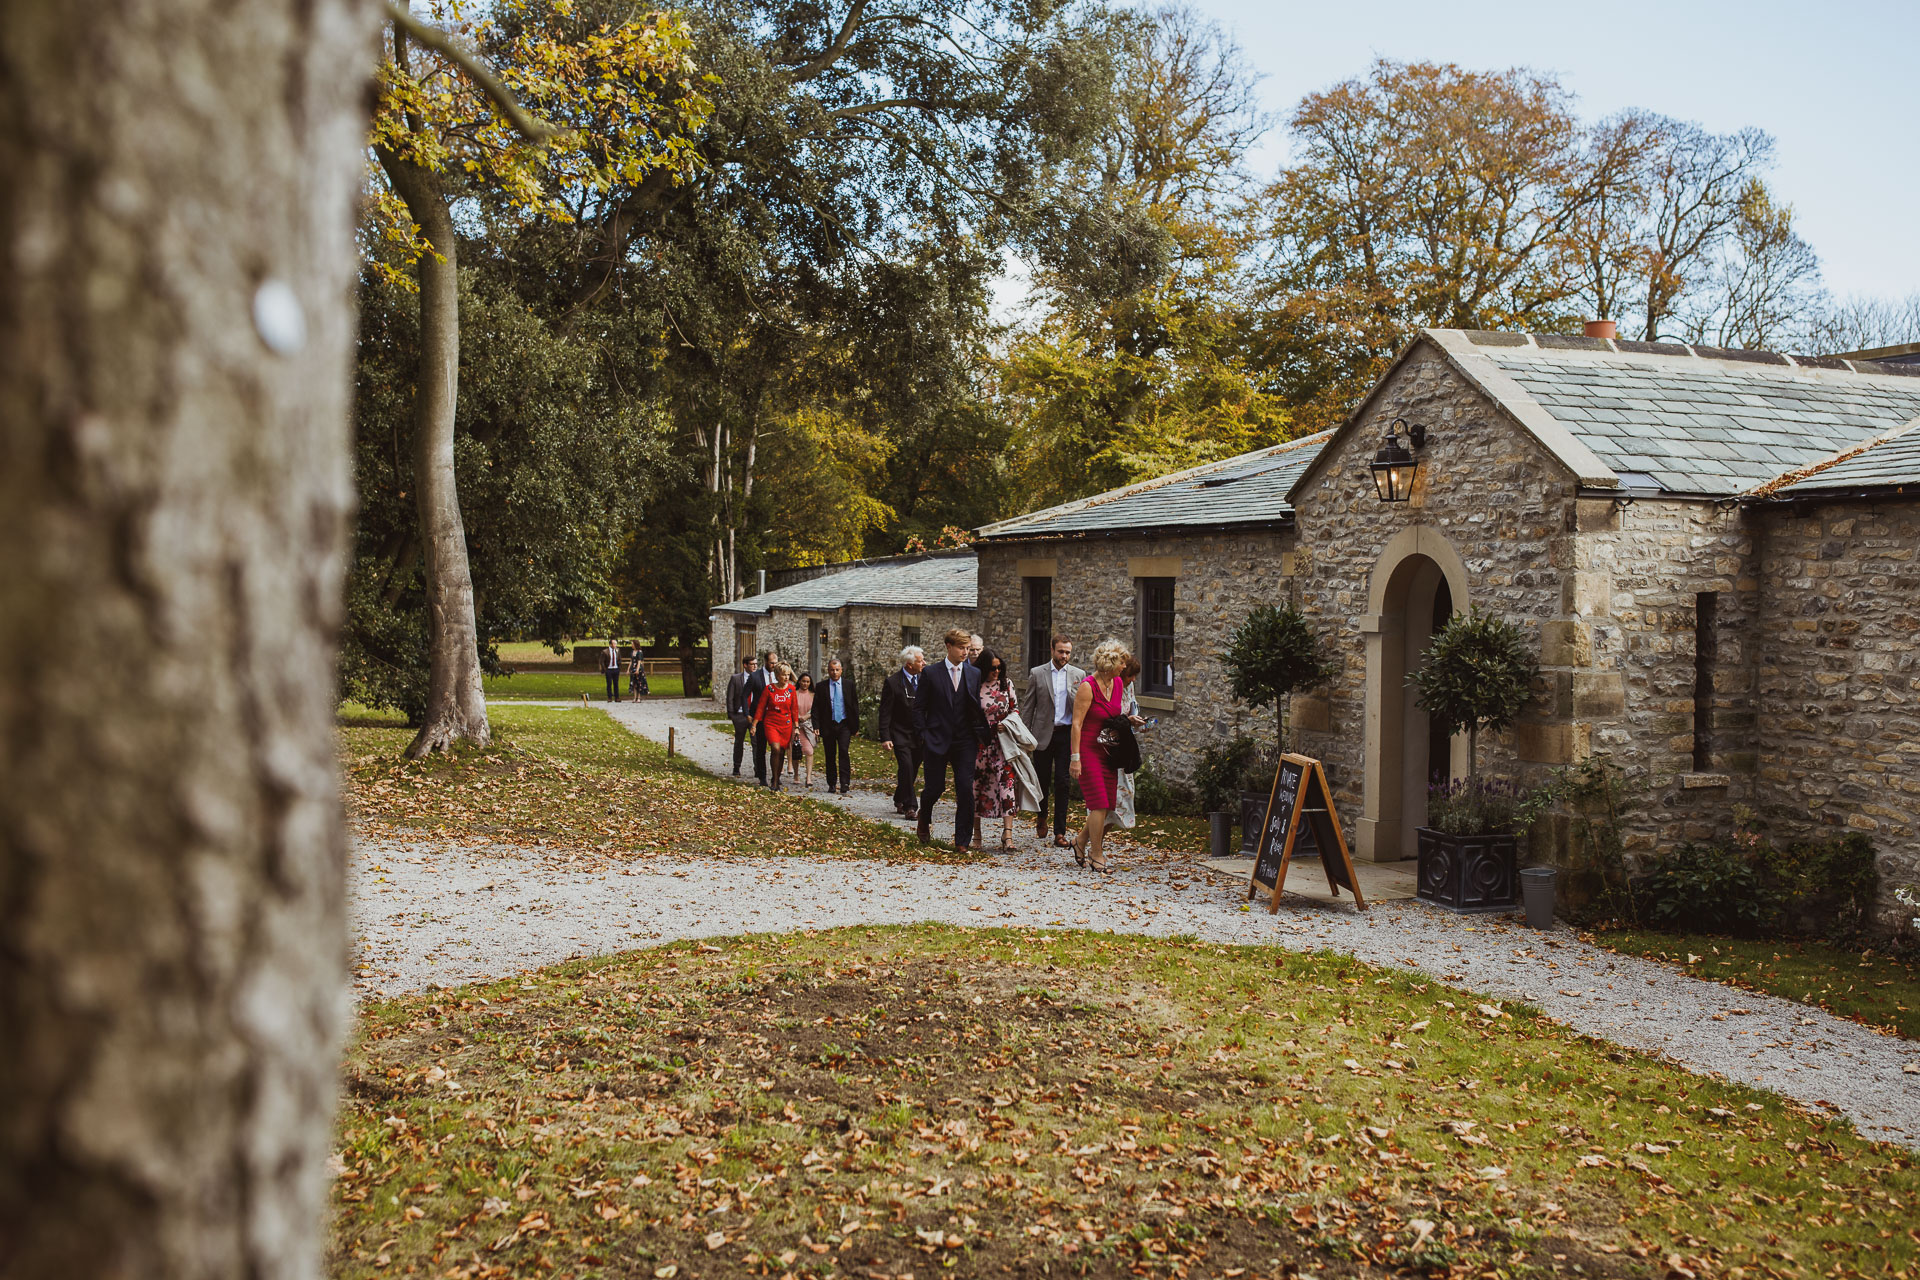 middleton_lodge_wedding_photographer-45.jpg